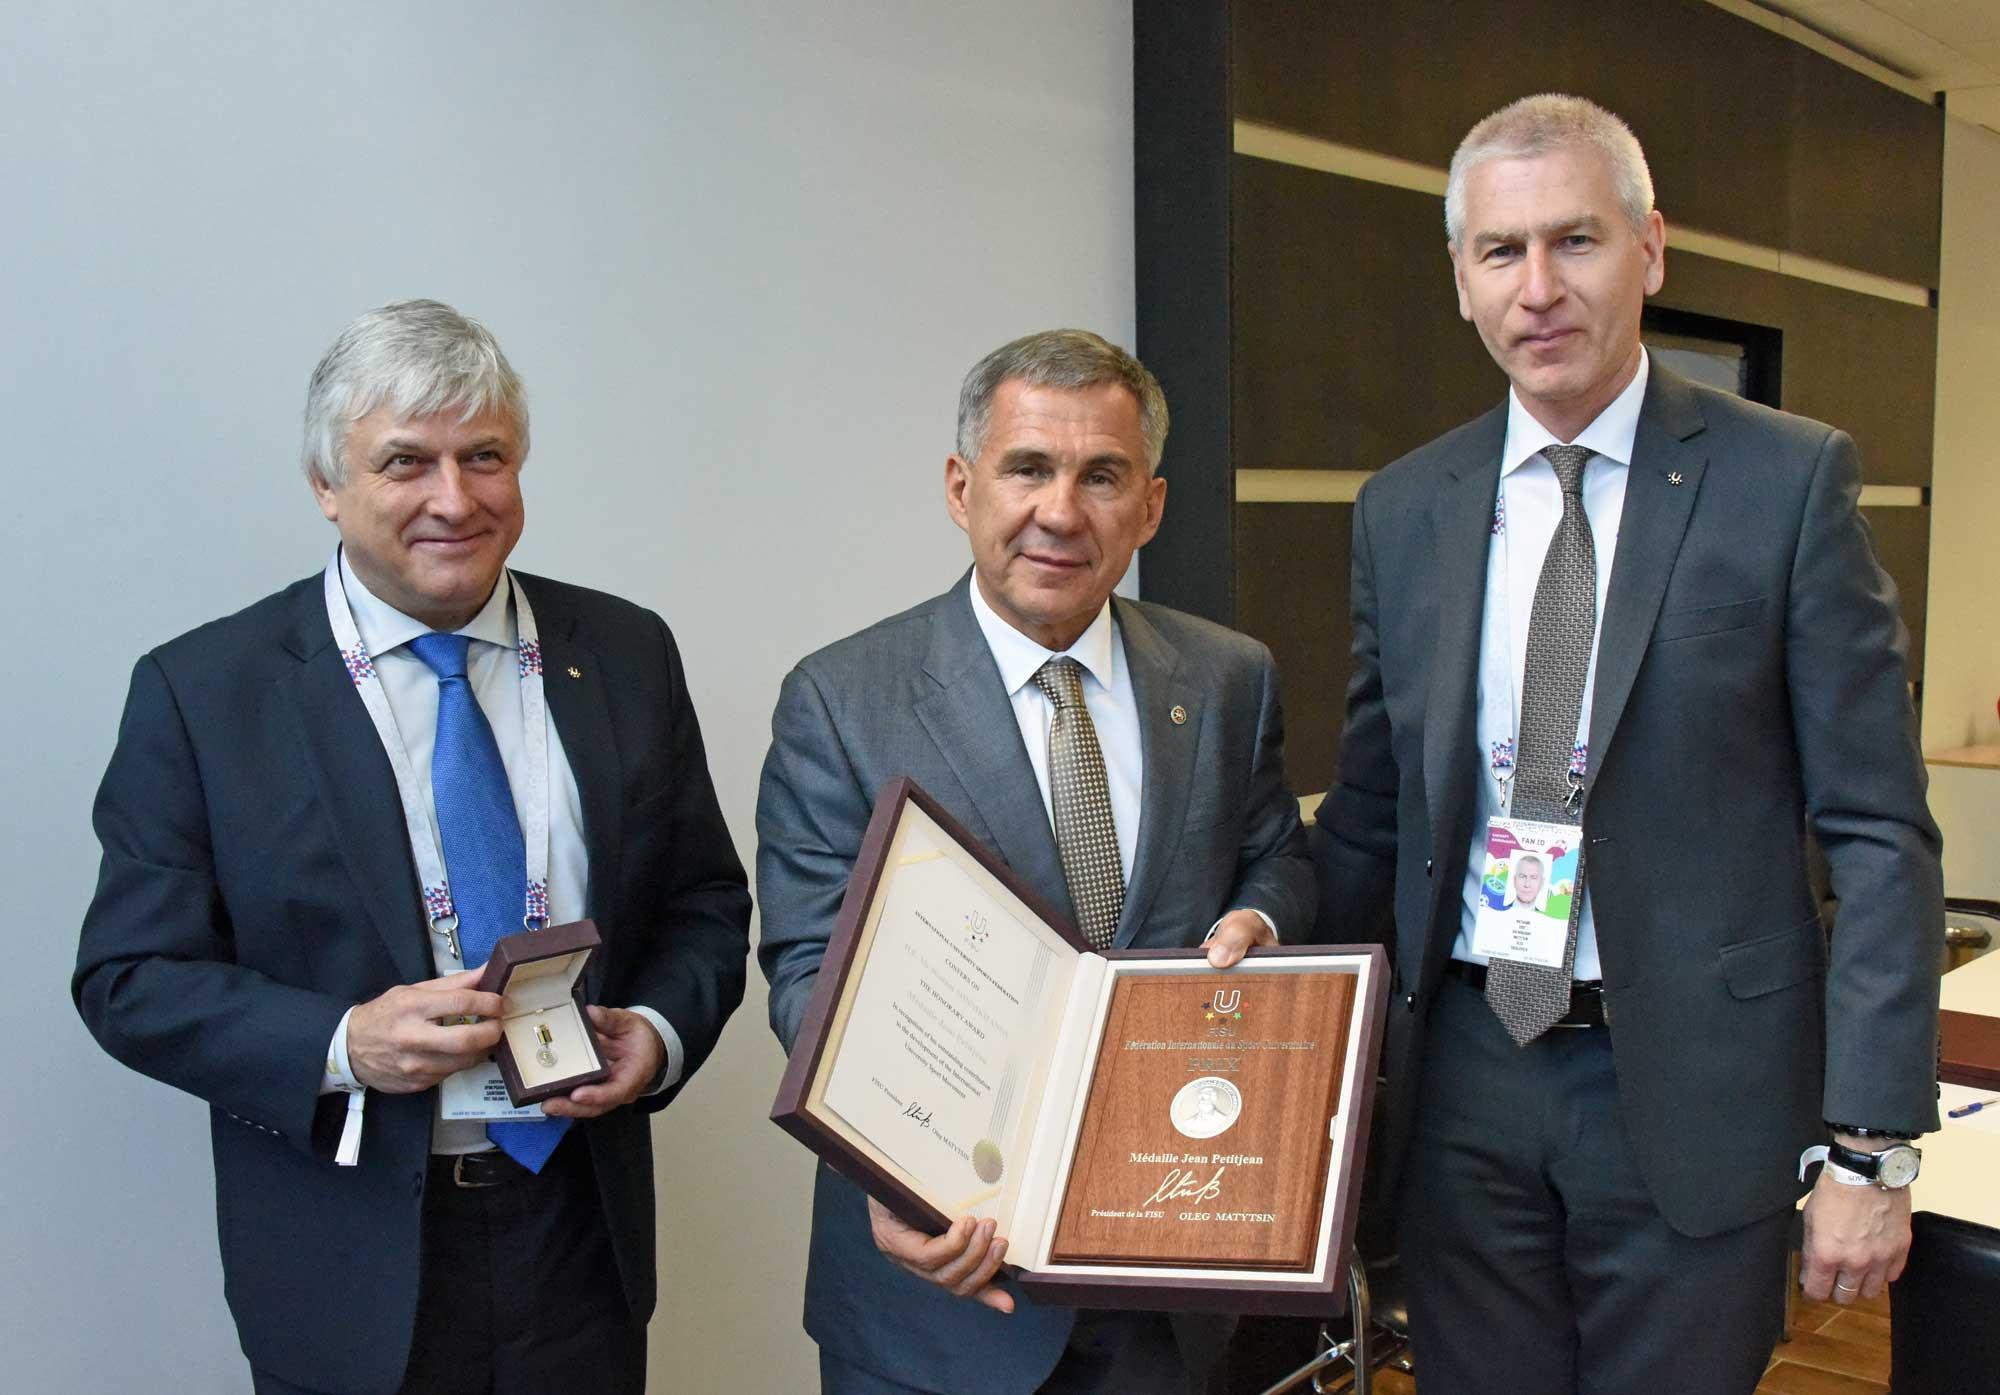 Tatarstan President receives Jean Petitjean award from FISU